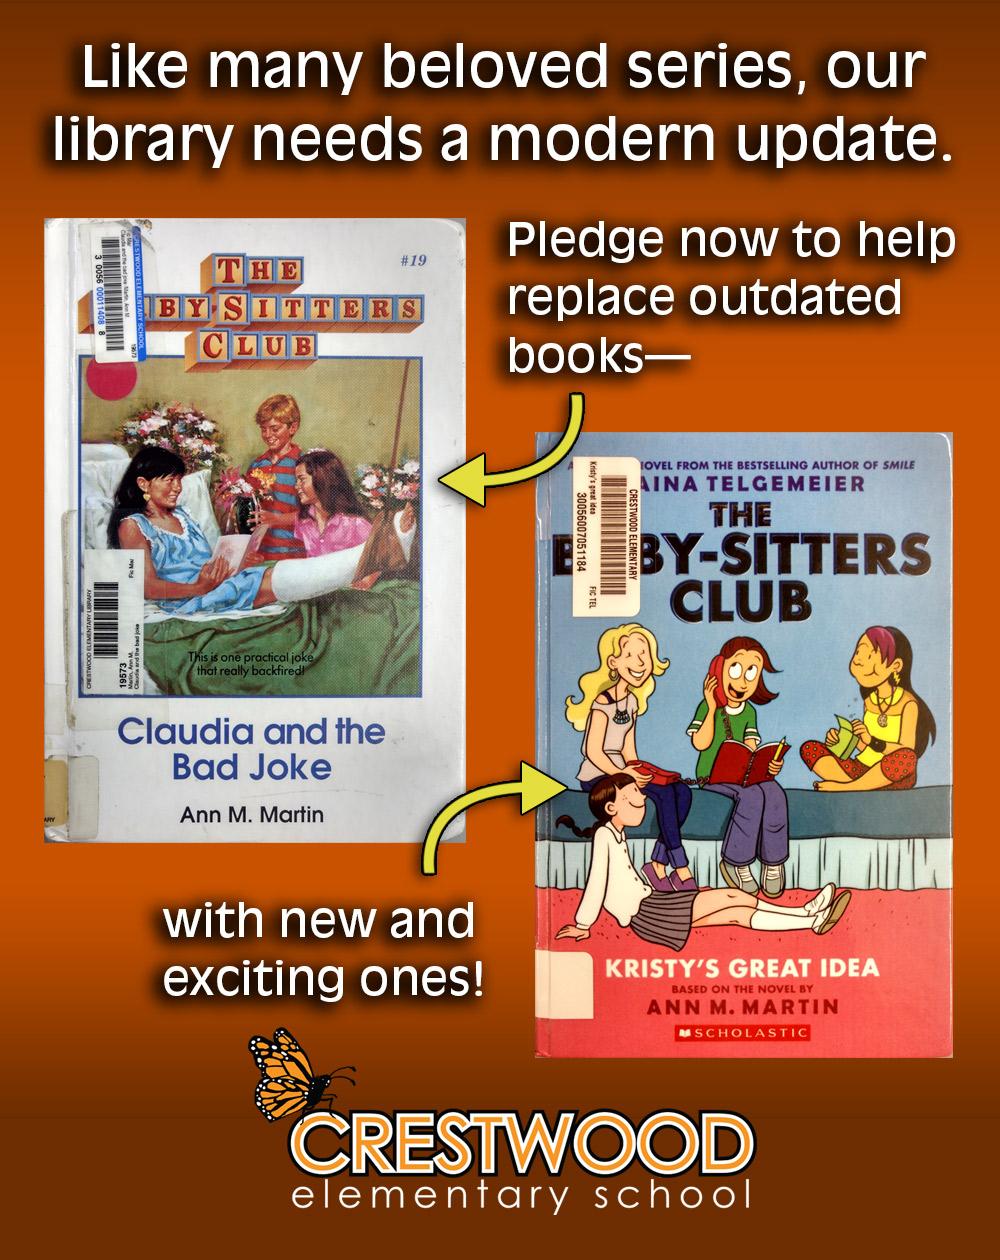 LibraryBabysitters.jpg